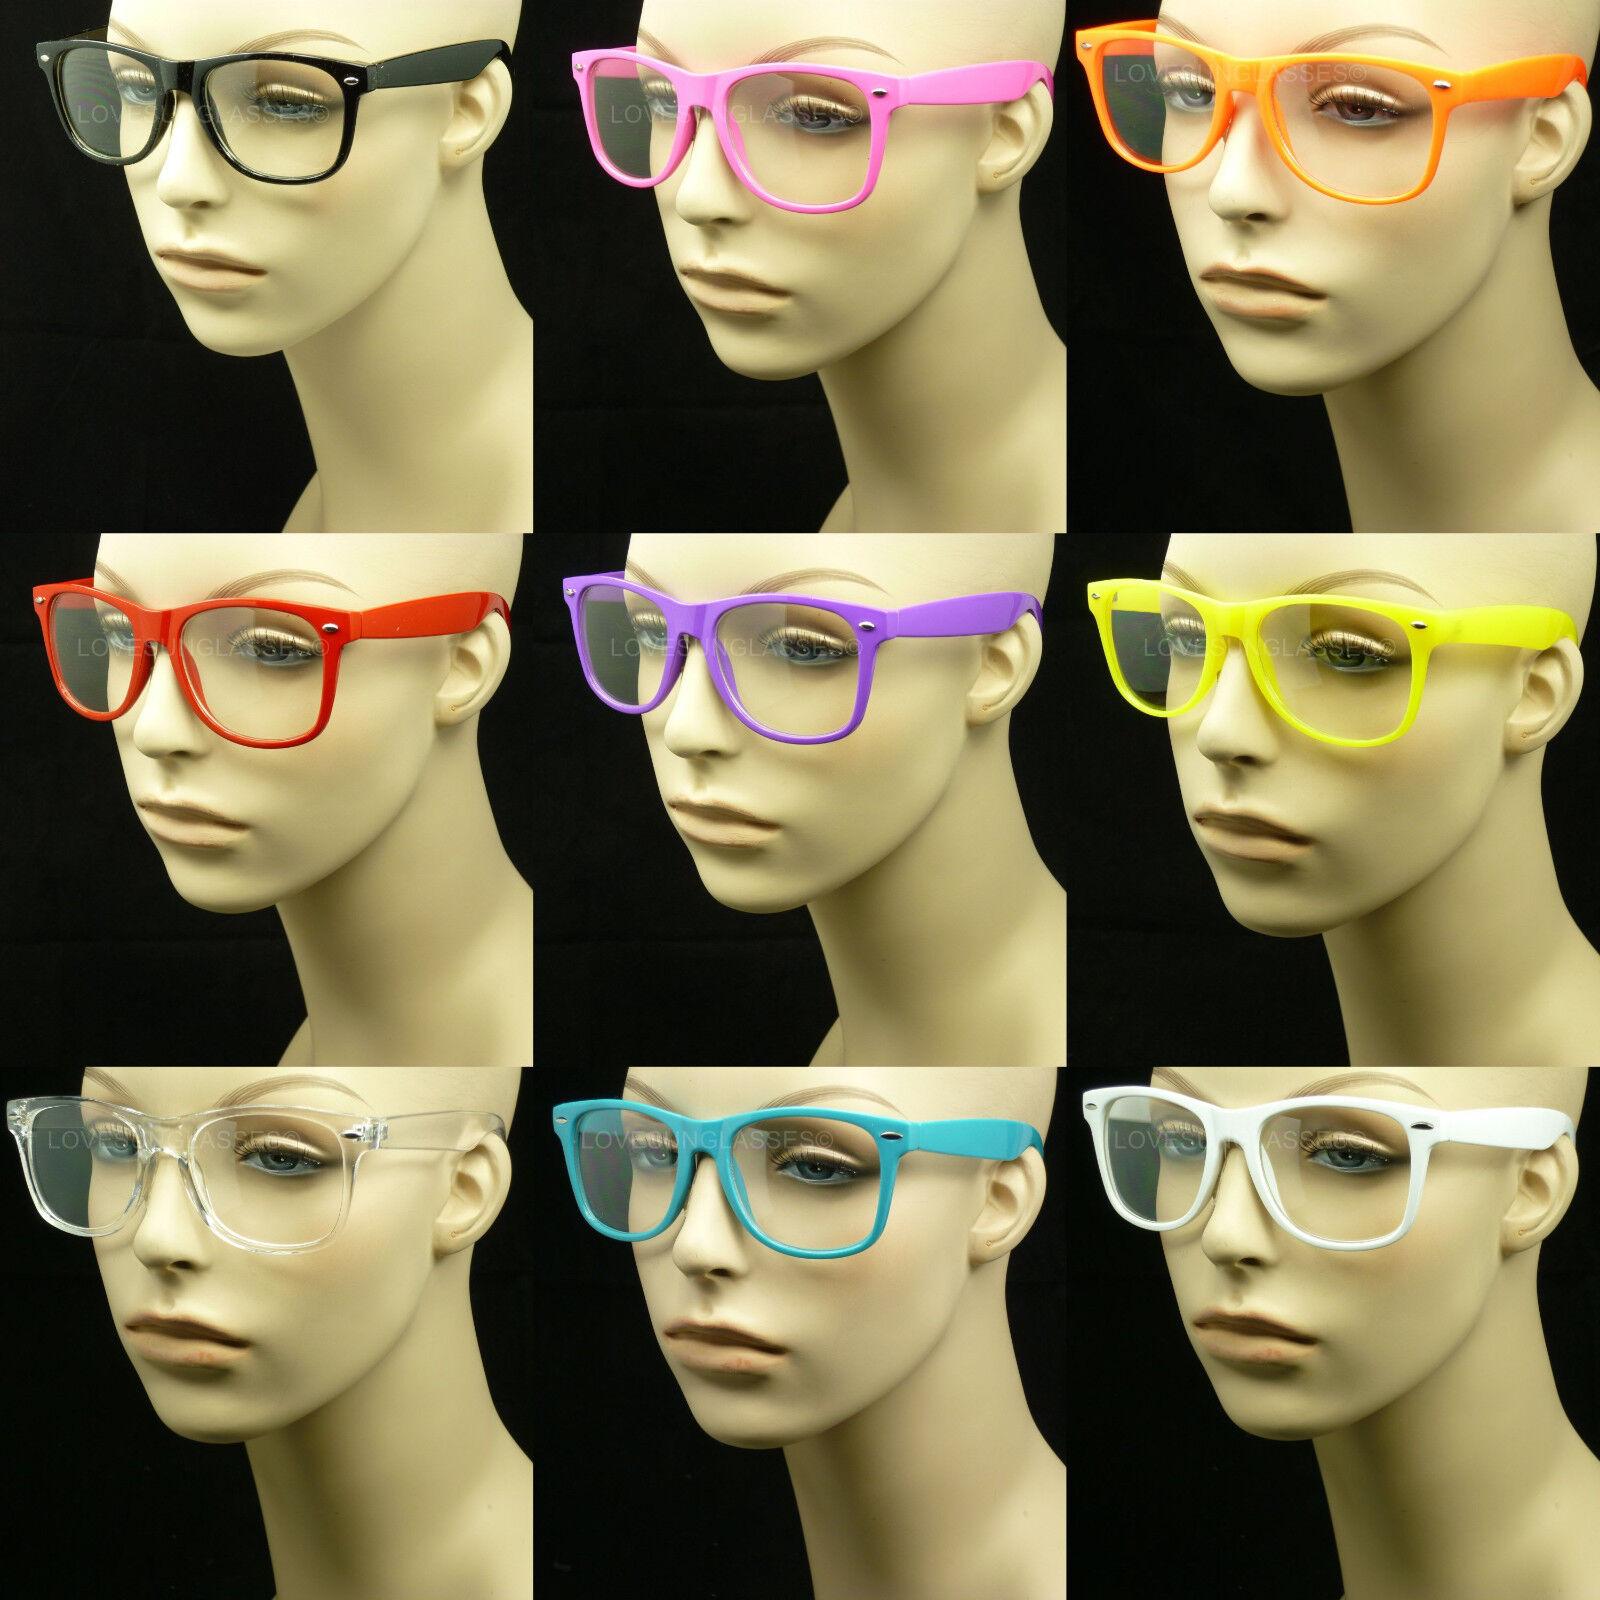 $4.99 - Clear lens glasses nerd geek fake eye wear men women fashion hipster frame style